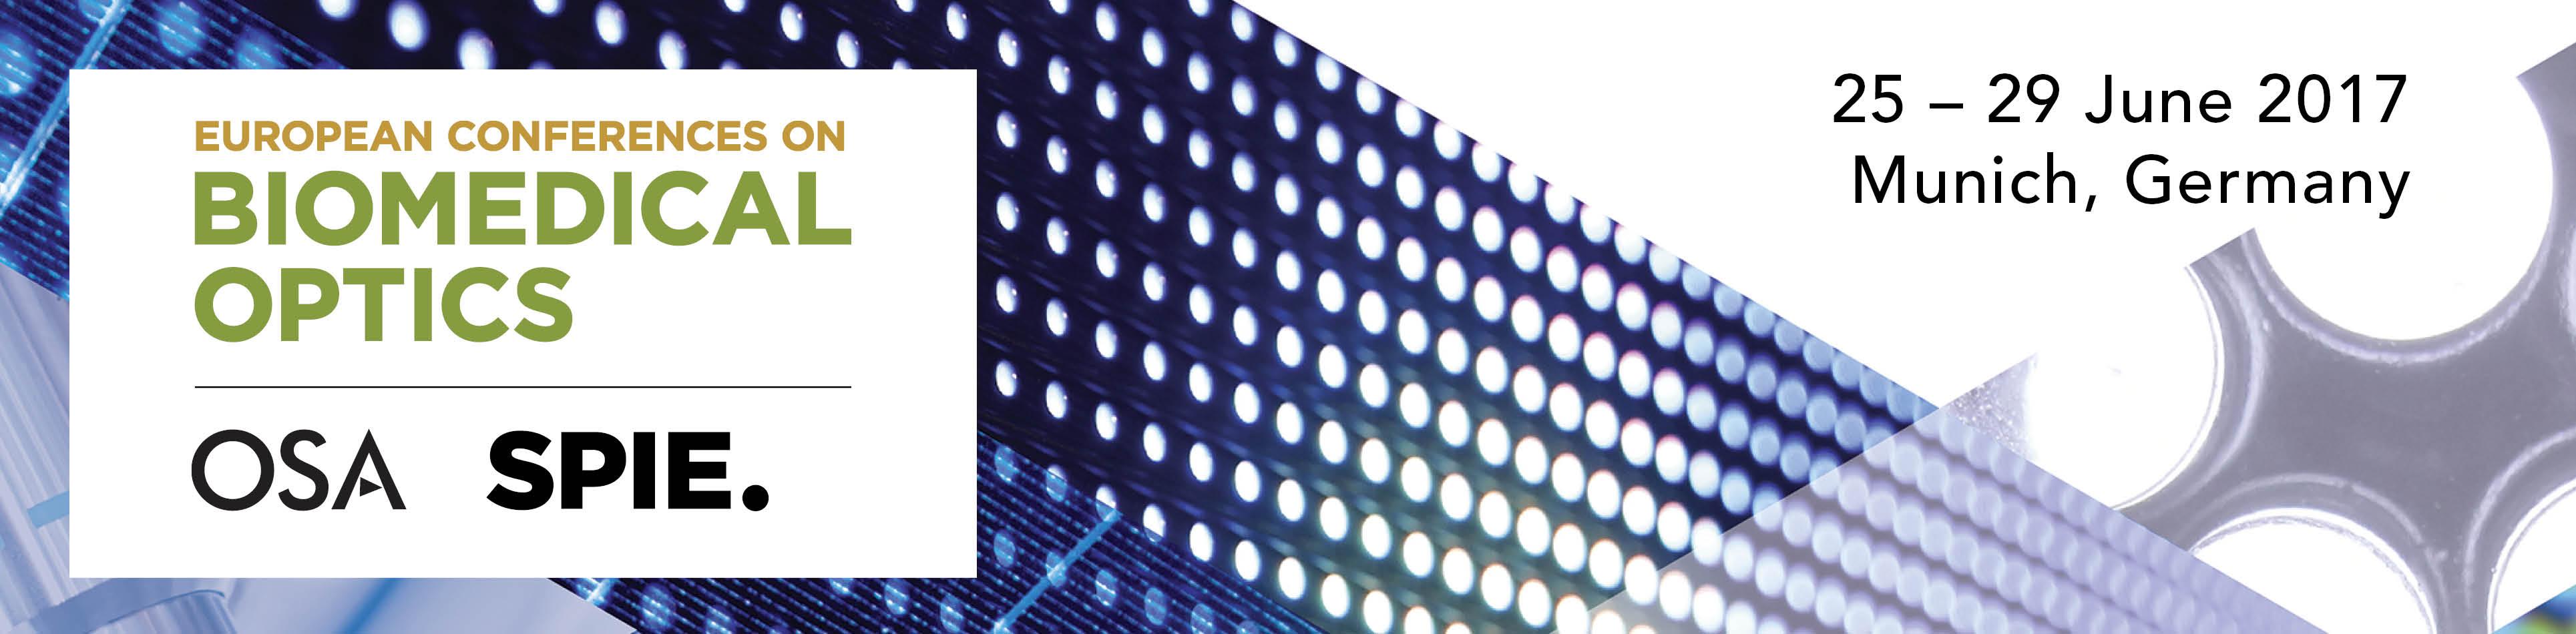 2017 European Conferences on Biomedical Optics (ECBO)